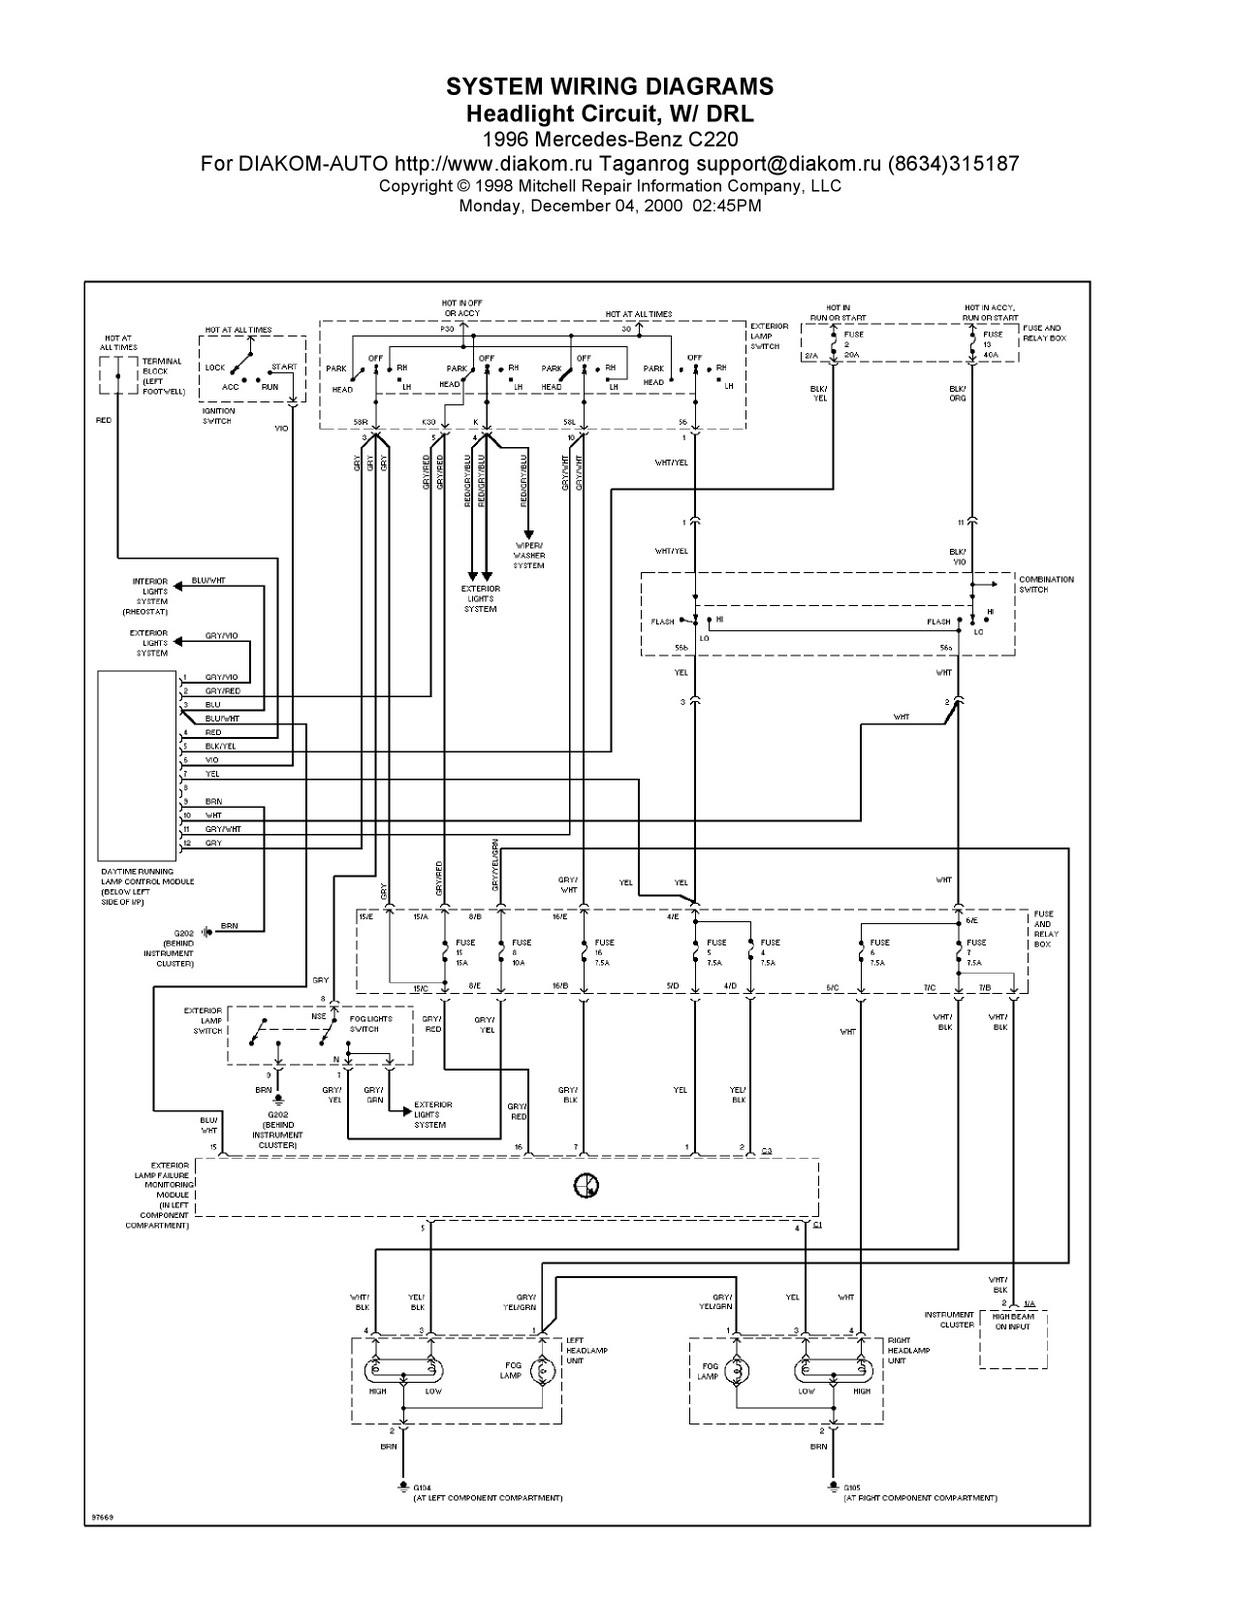 1996 MercedesBenz C220 System Wiring Diagrams Headlight